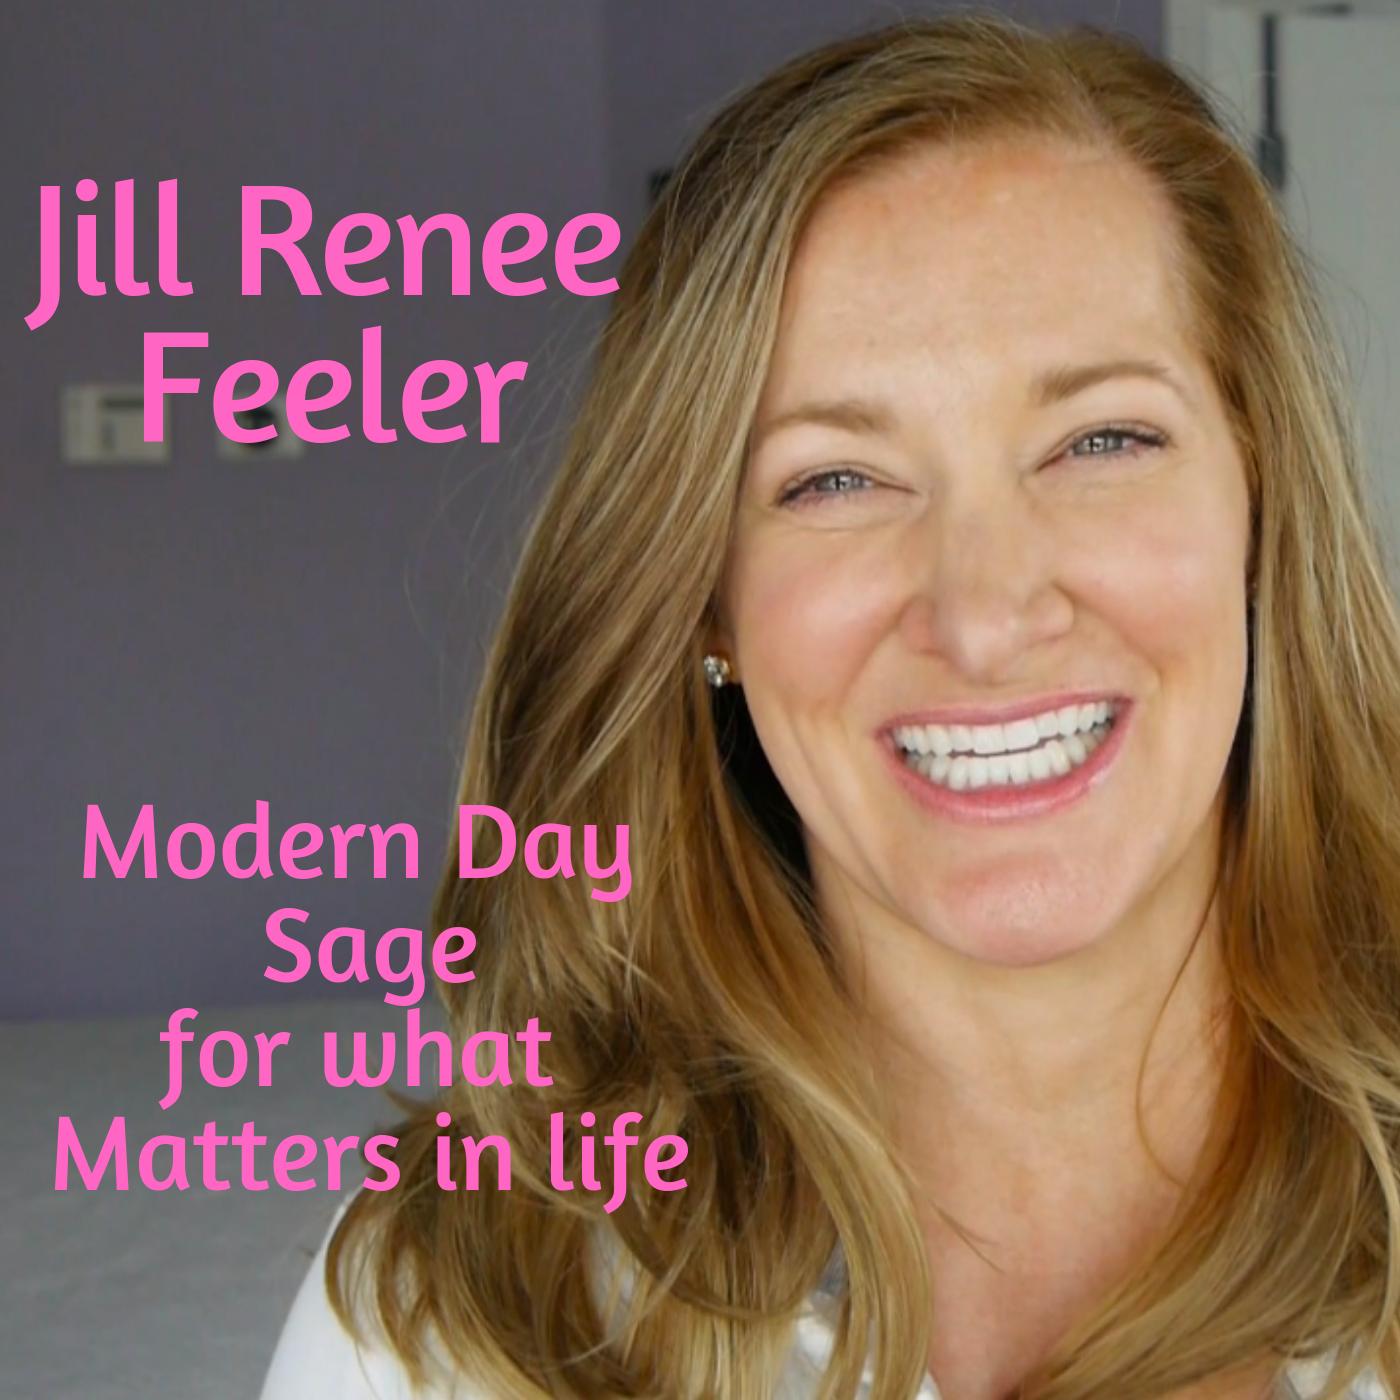 Jill Renee Feeler Podcast: Creating the Platinum Age